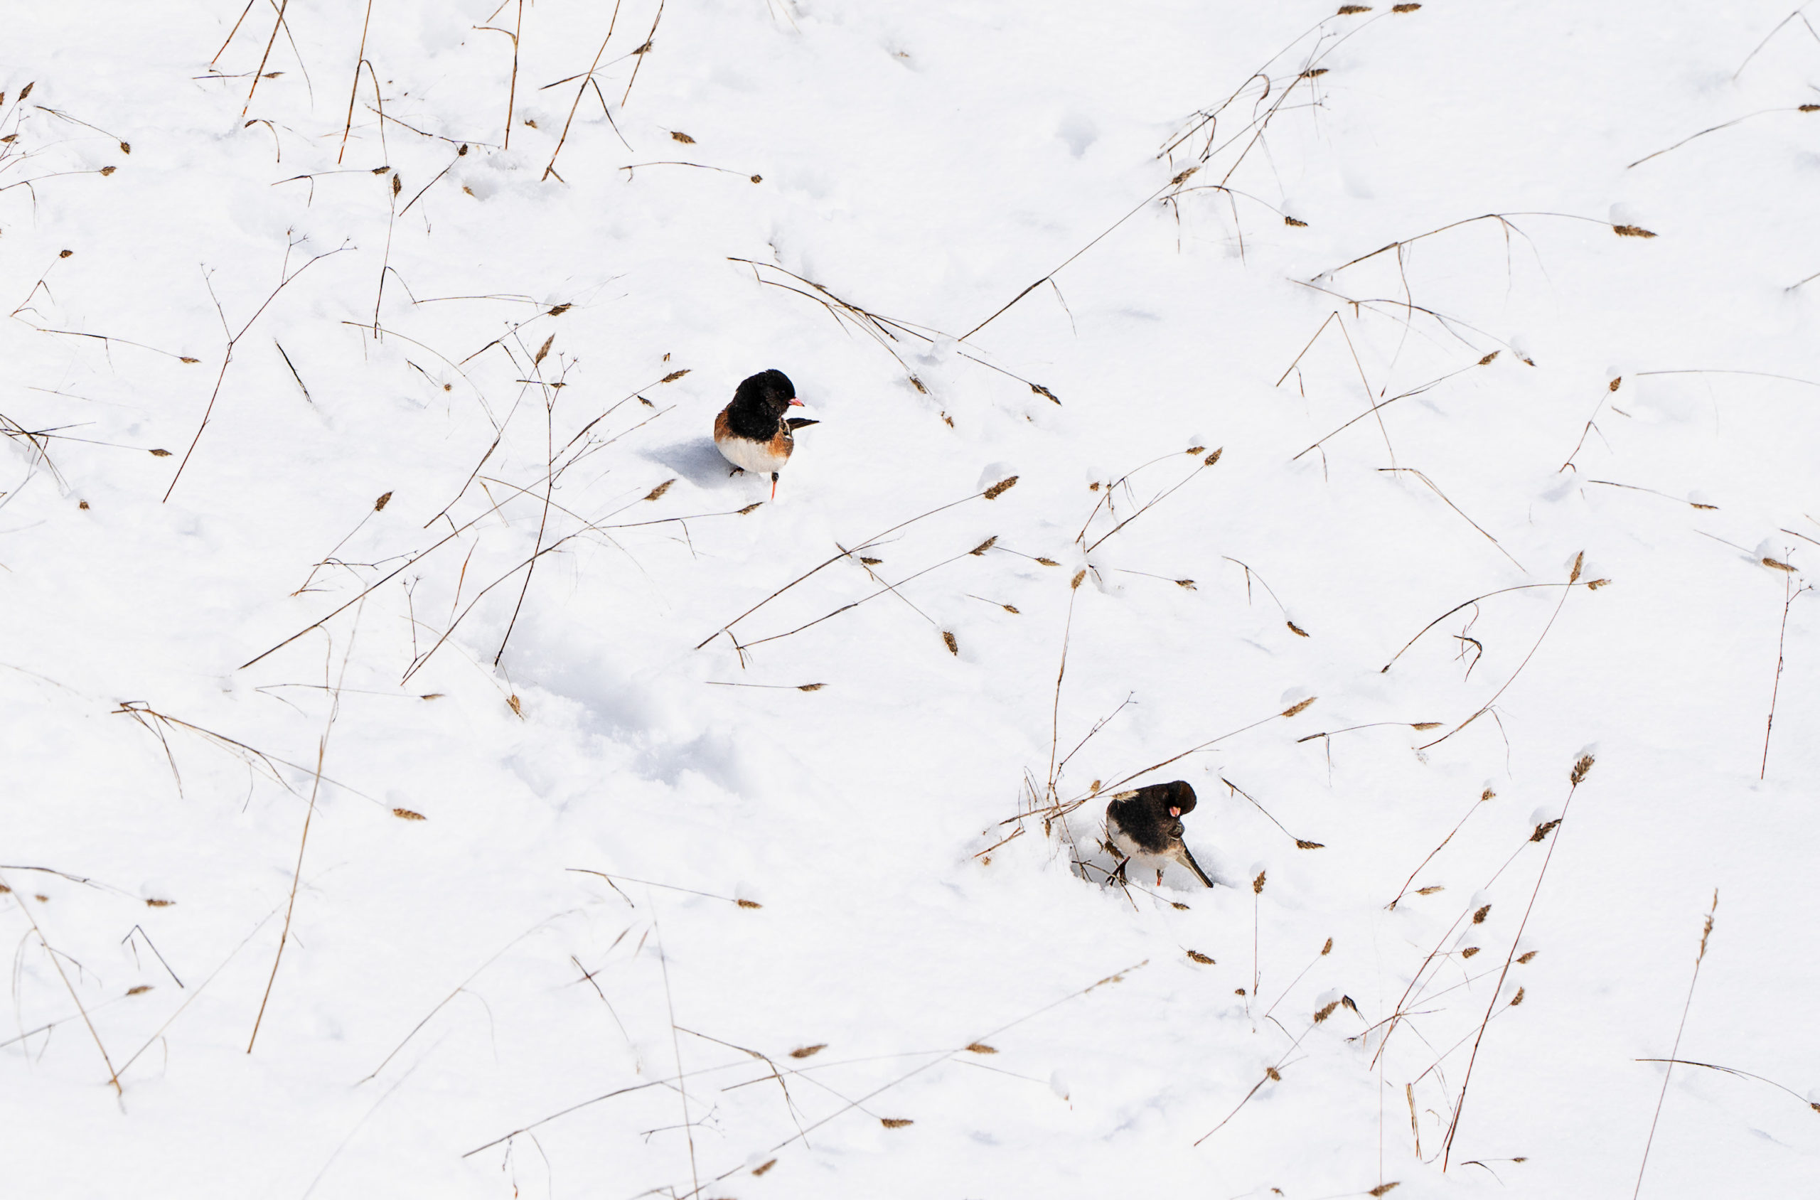 Two Little Birds, Each on my doorstep